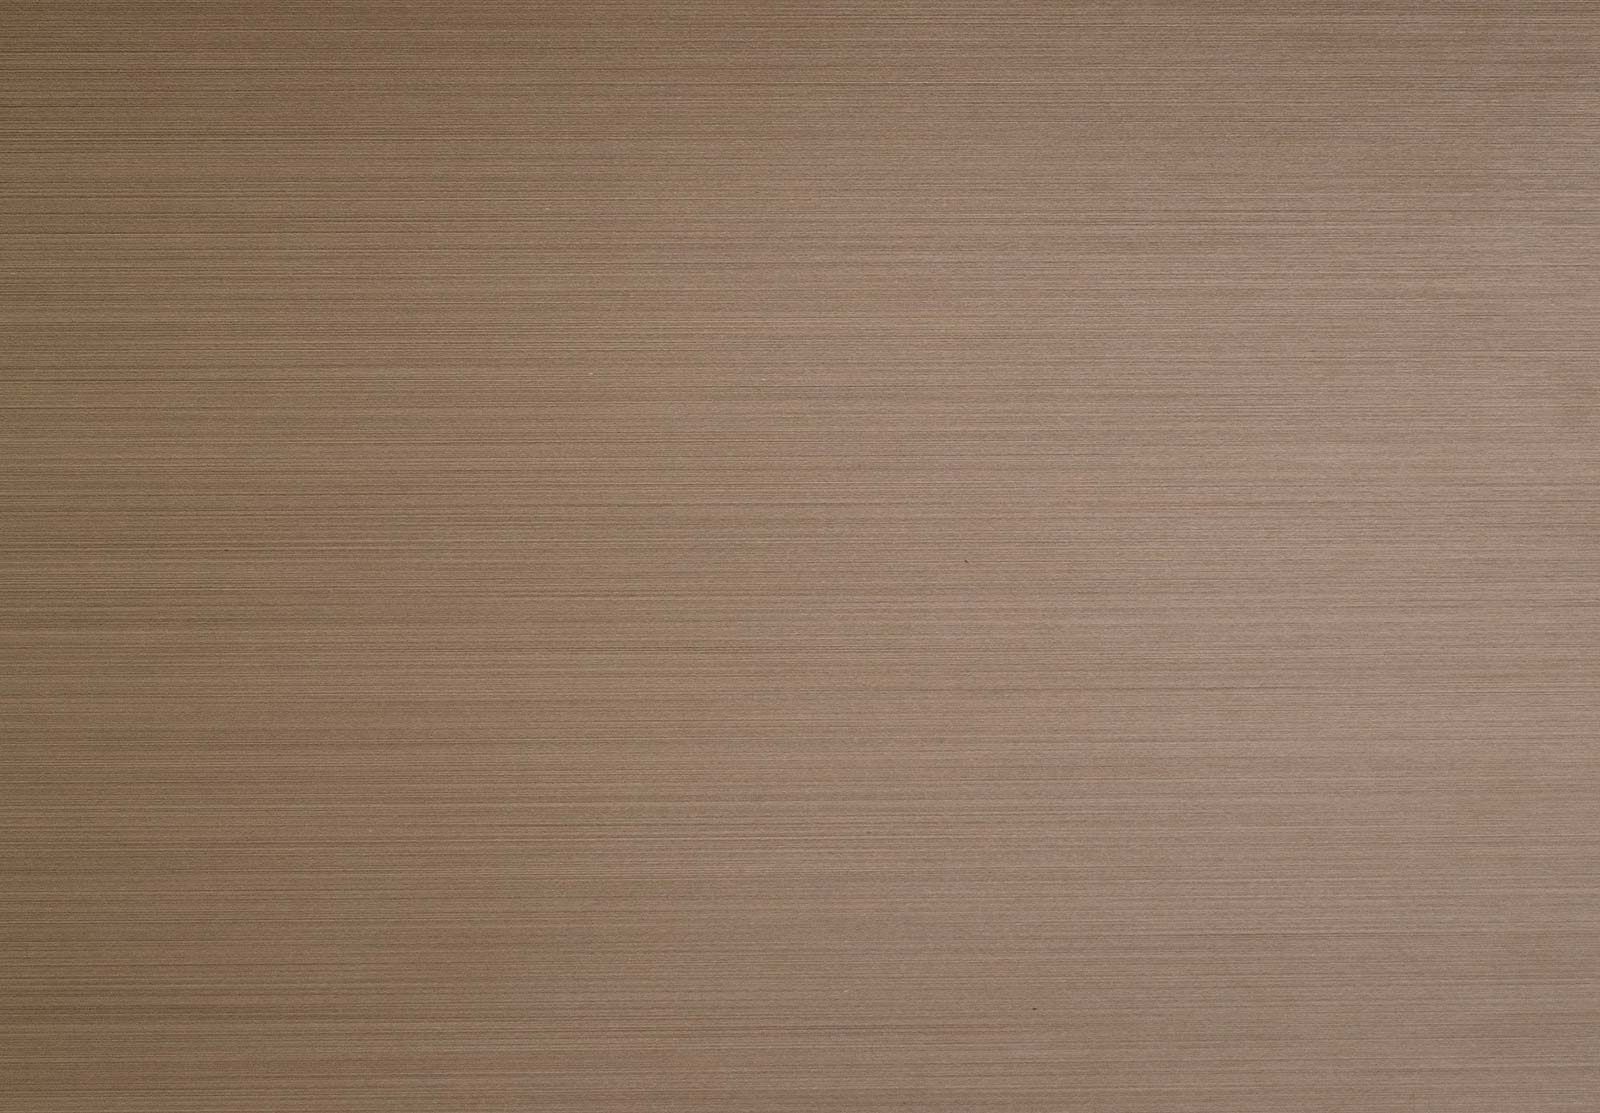 Pannelli alfawood - Lucent Rada 3013